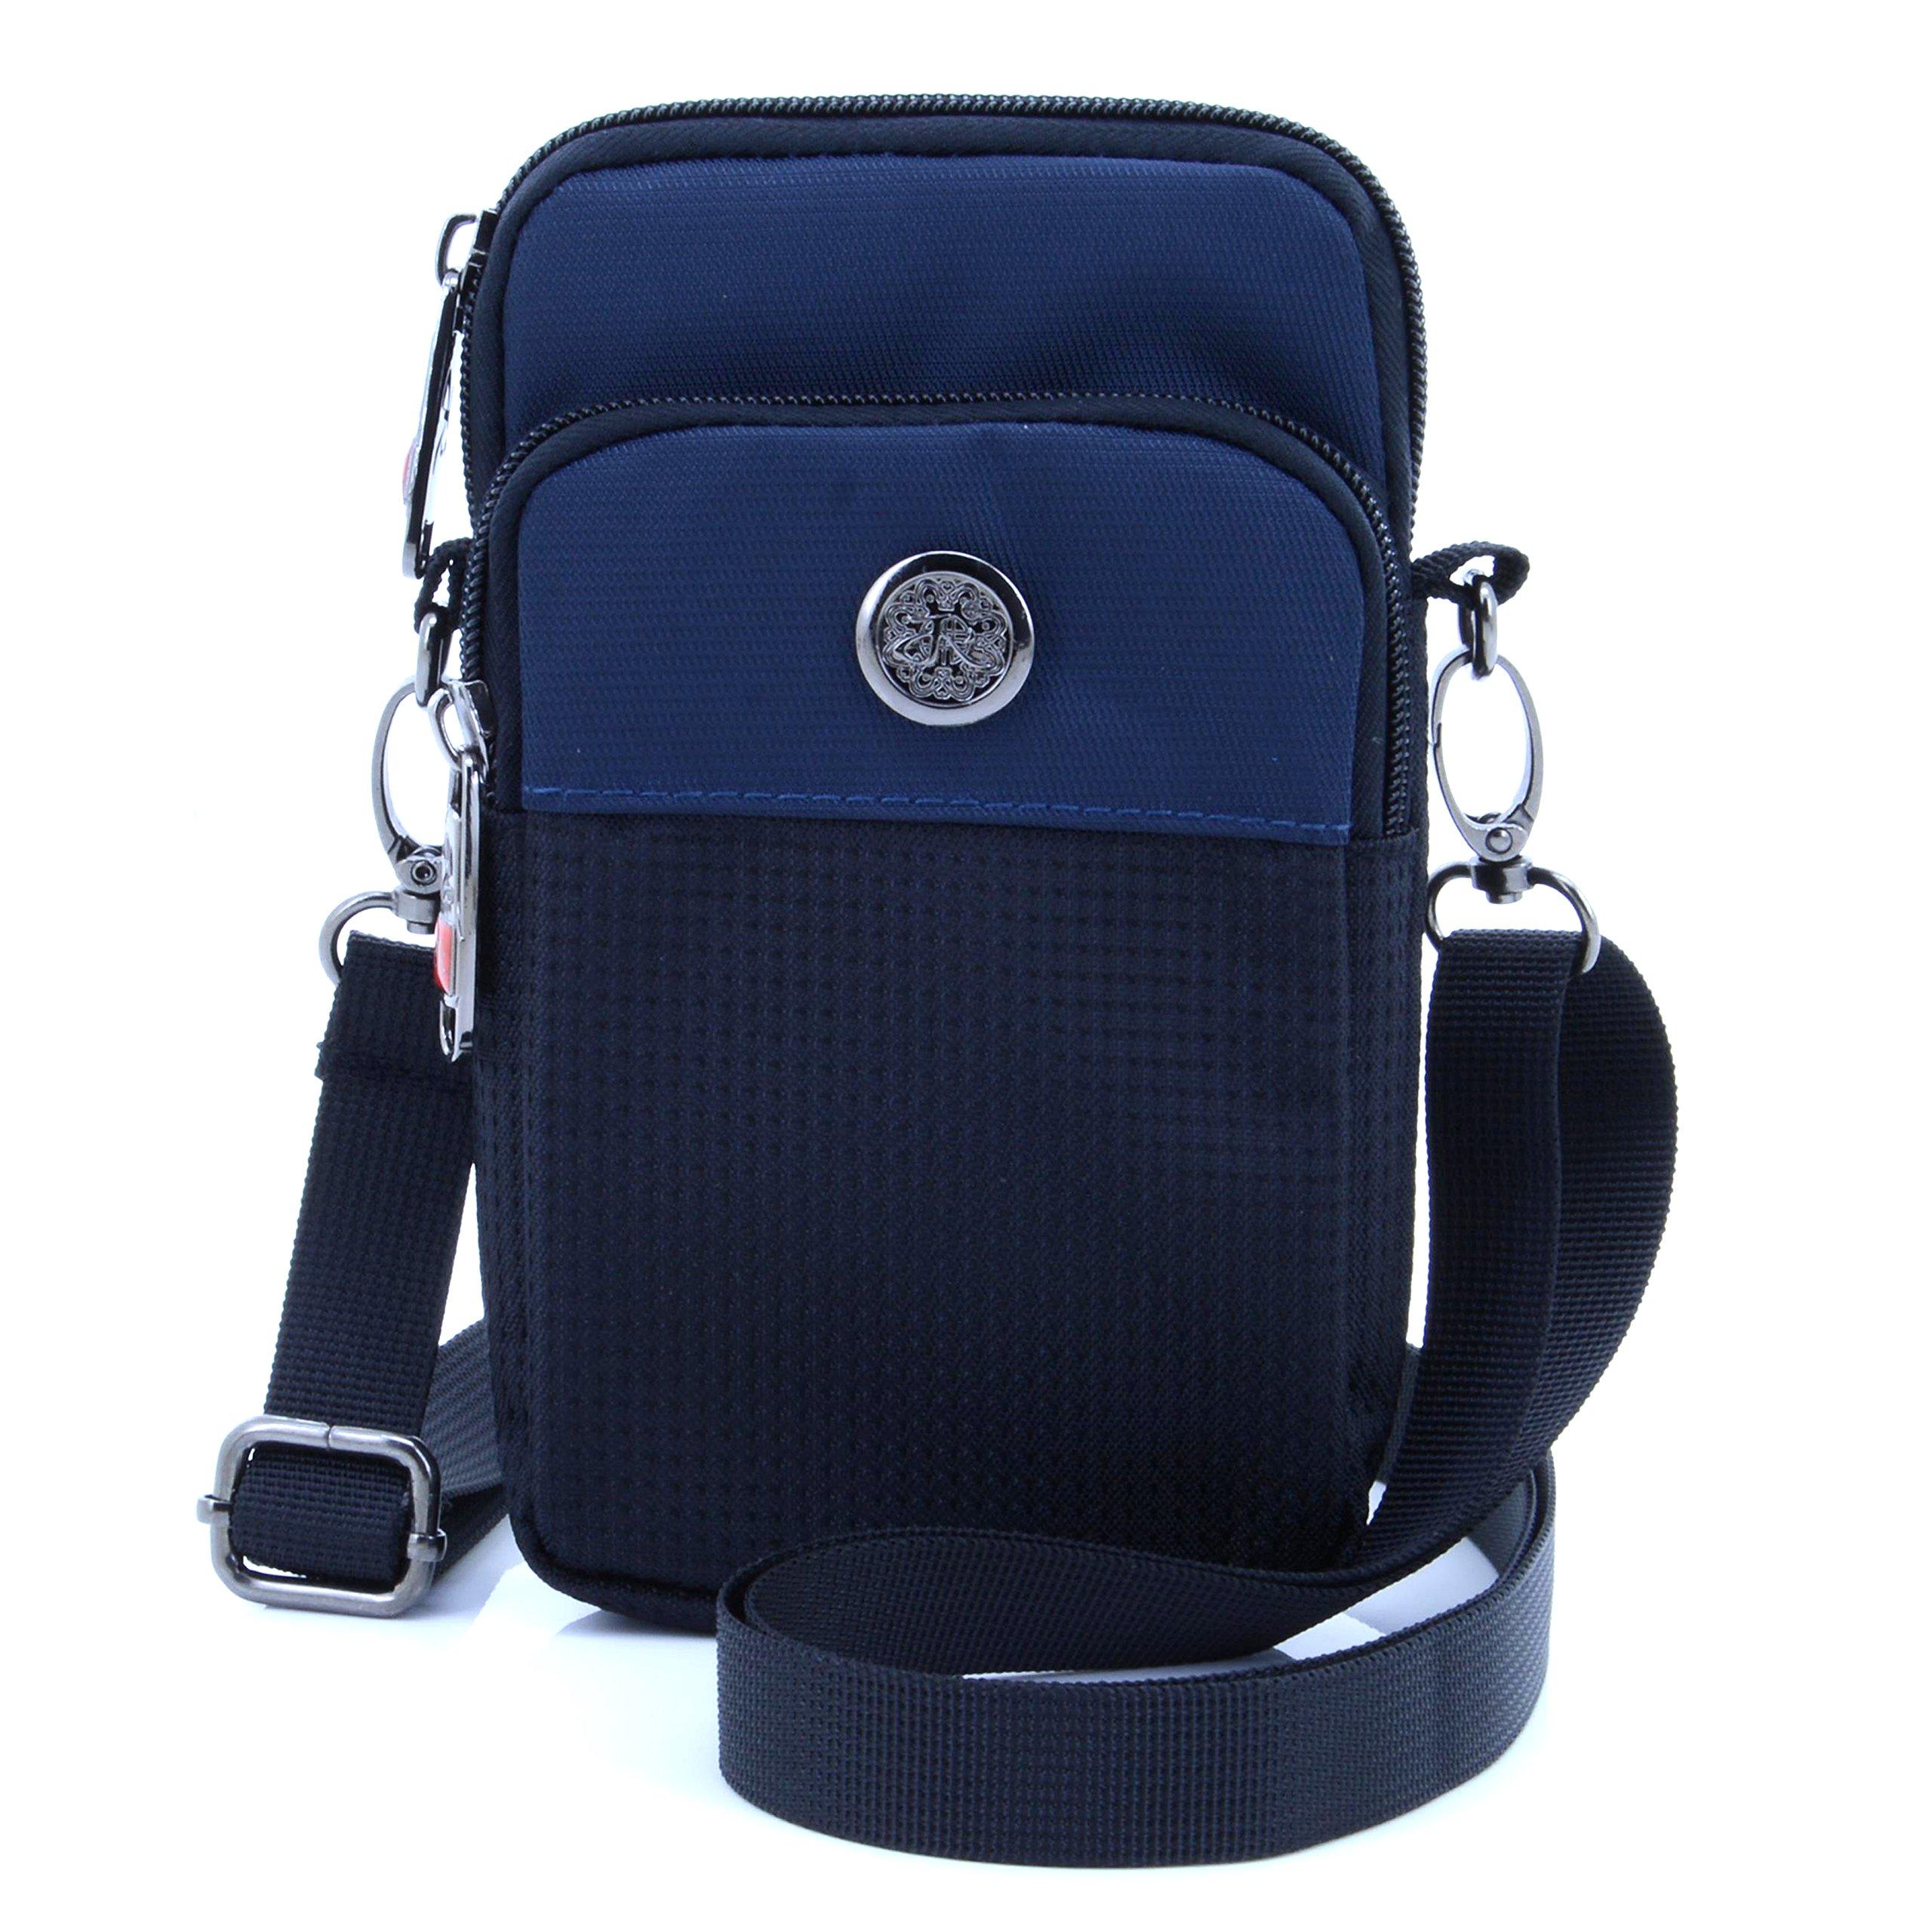 "U-TIMES Casual Water Resistant Oxford Waist Wallet Bag 6"" Crossbody Shoulder Phone Pouch(Dark Blue)"